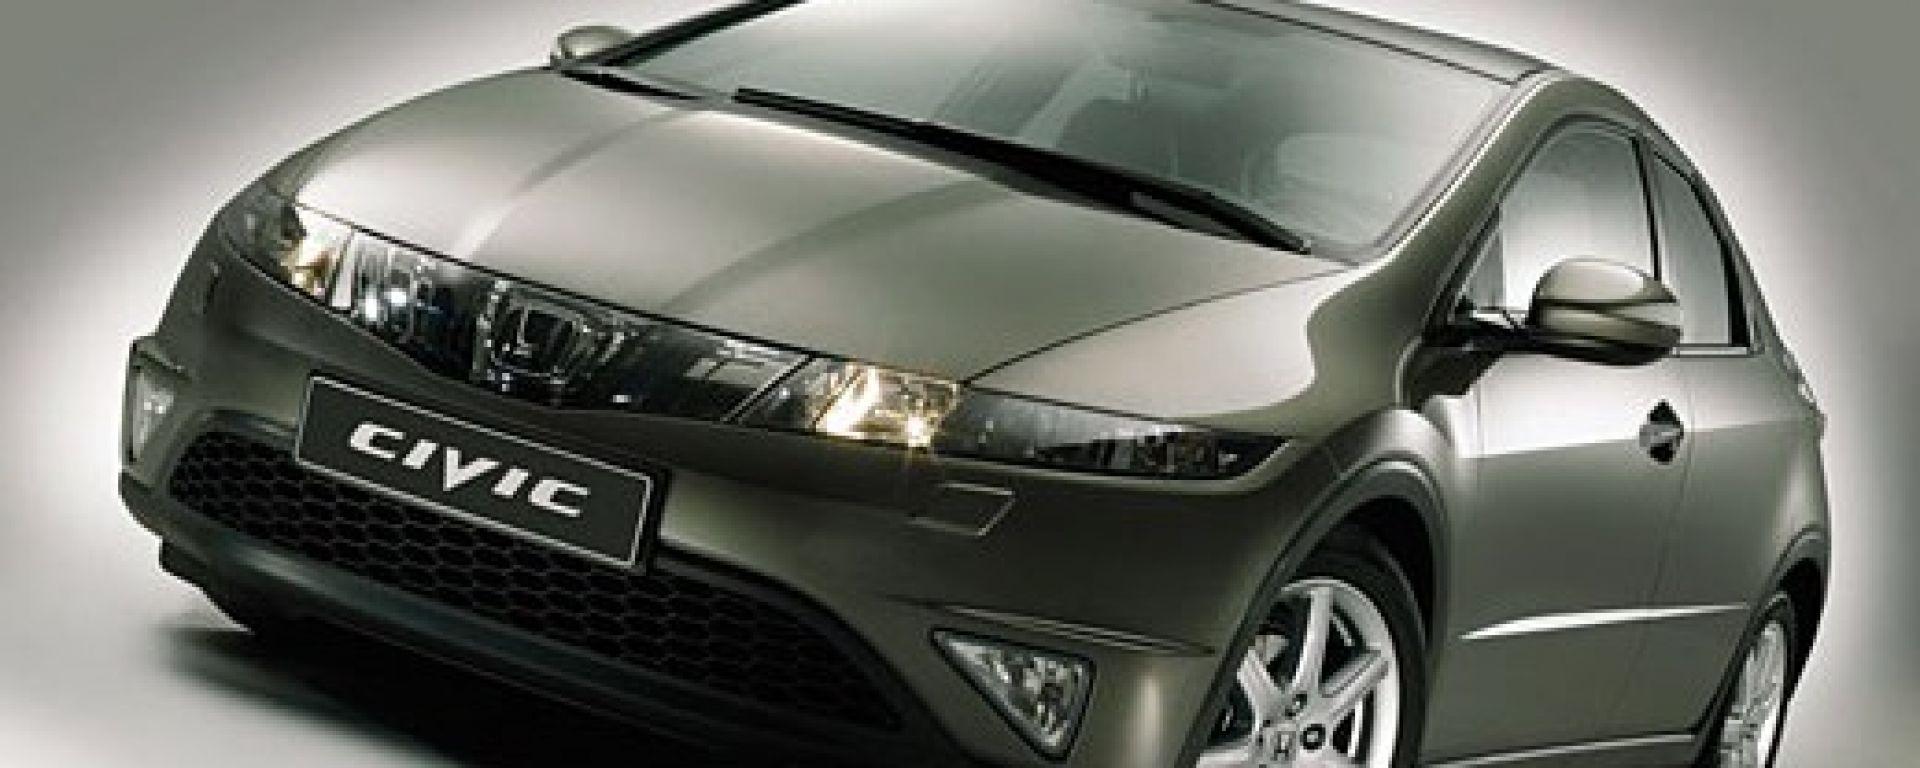 Honda Civic 2006: le foto ufficiali